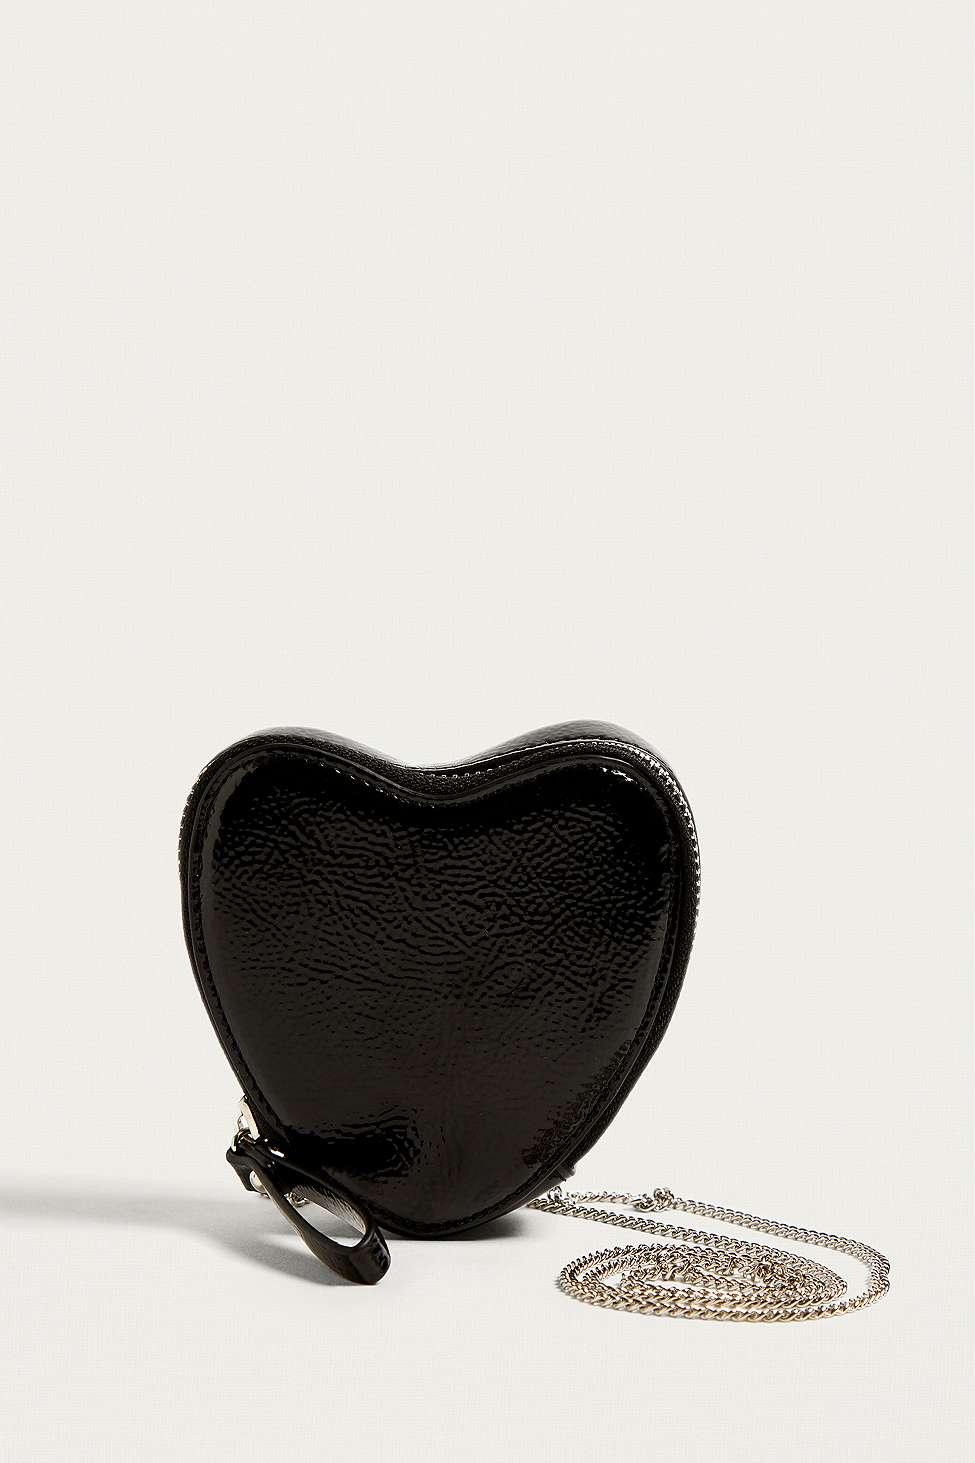 Rachel Icon Heart Crossbody, Black